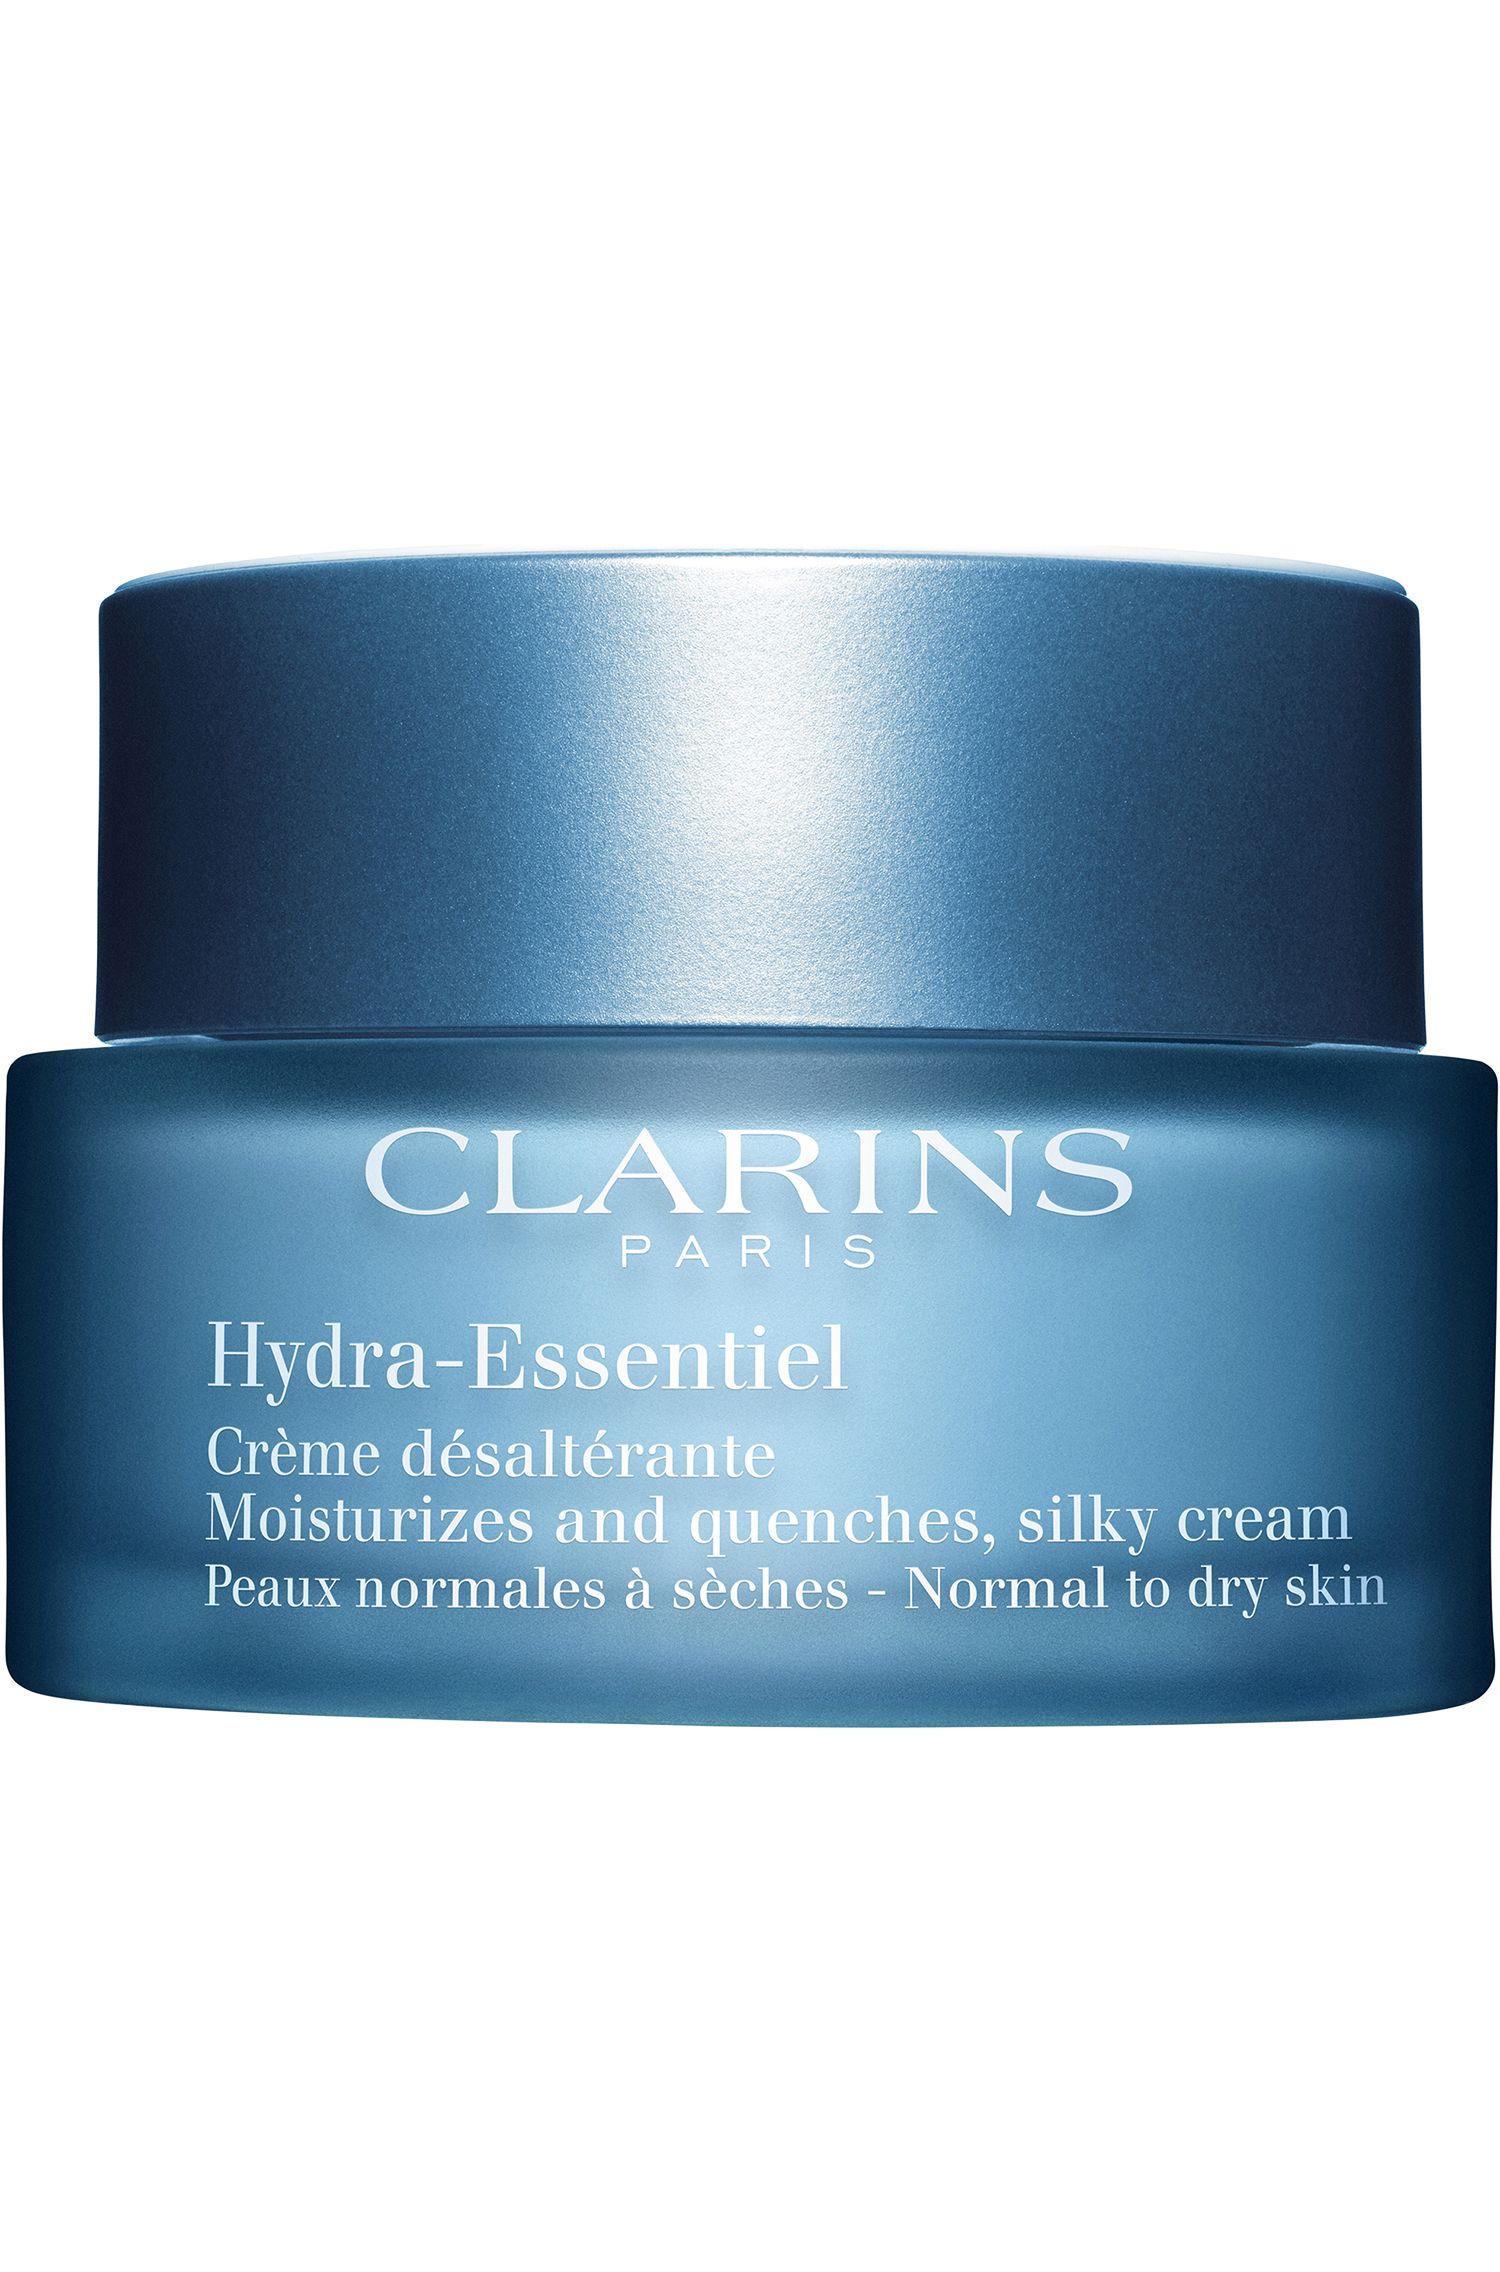 Blissim : Clarins - Crème hydratante visage Hydra-Essentiel - Crème hydratante visage Hydra-Essentiel